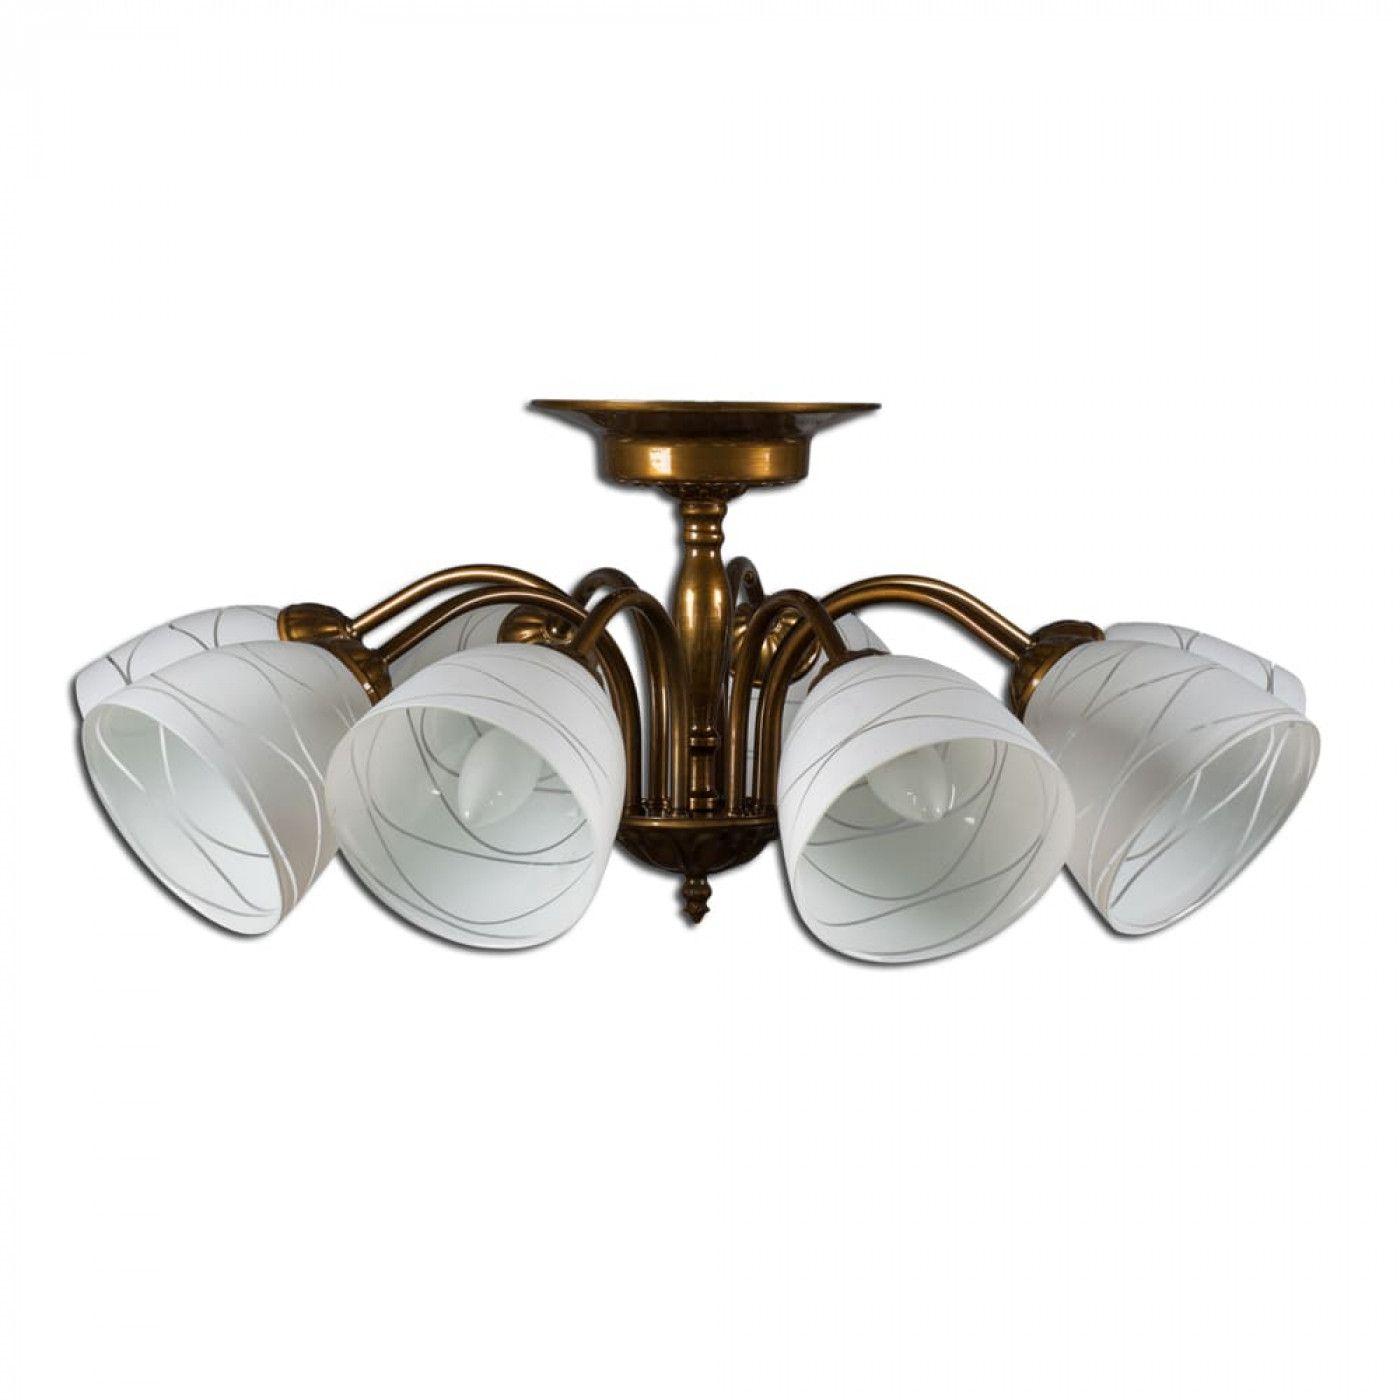 PETRASVET / Ceiling chandelier S2116-8, 8xE27 max. 60W